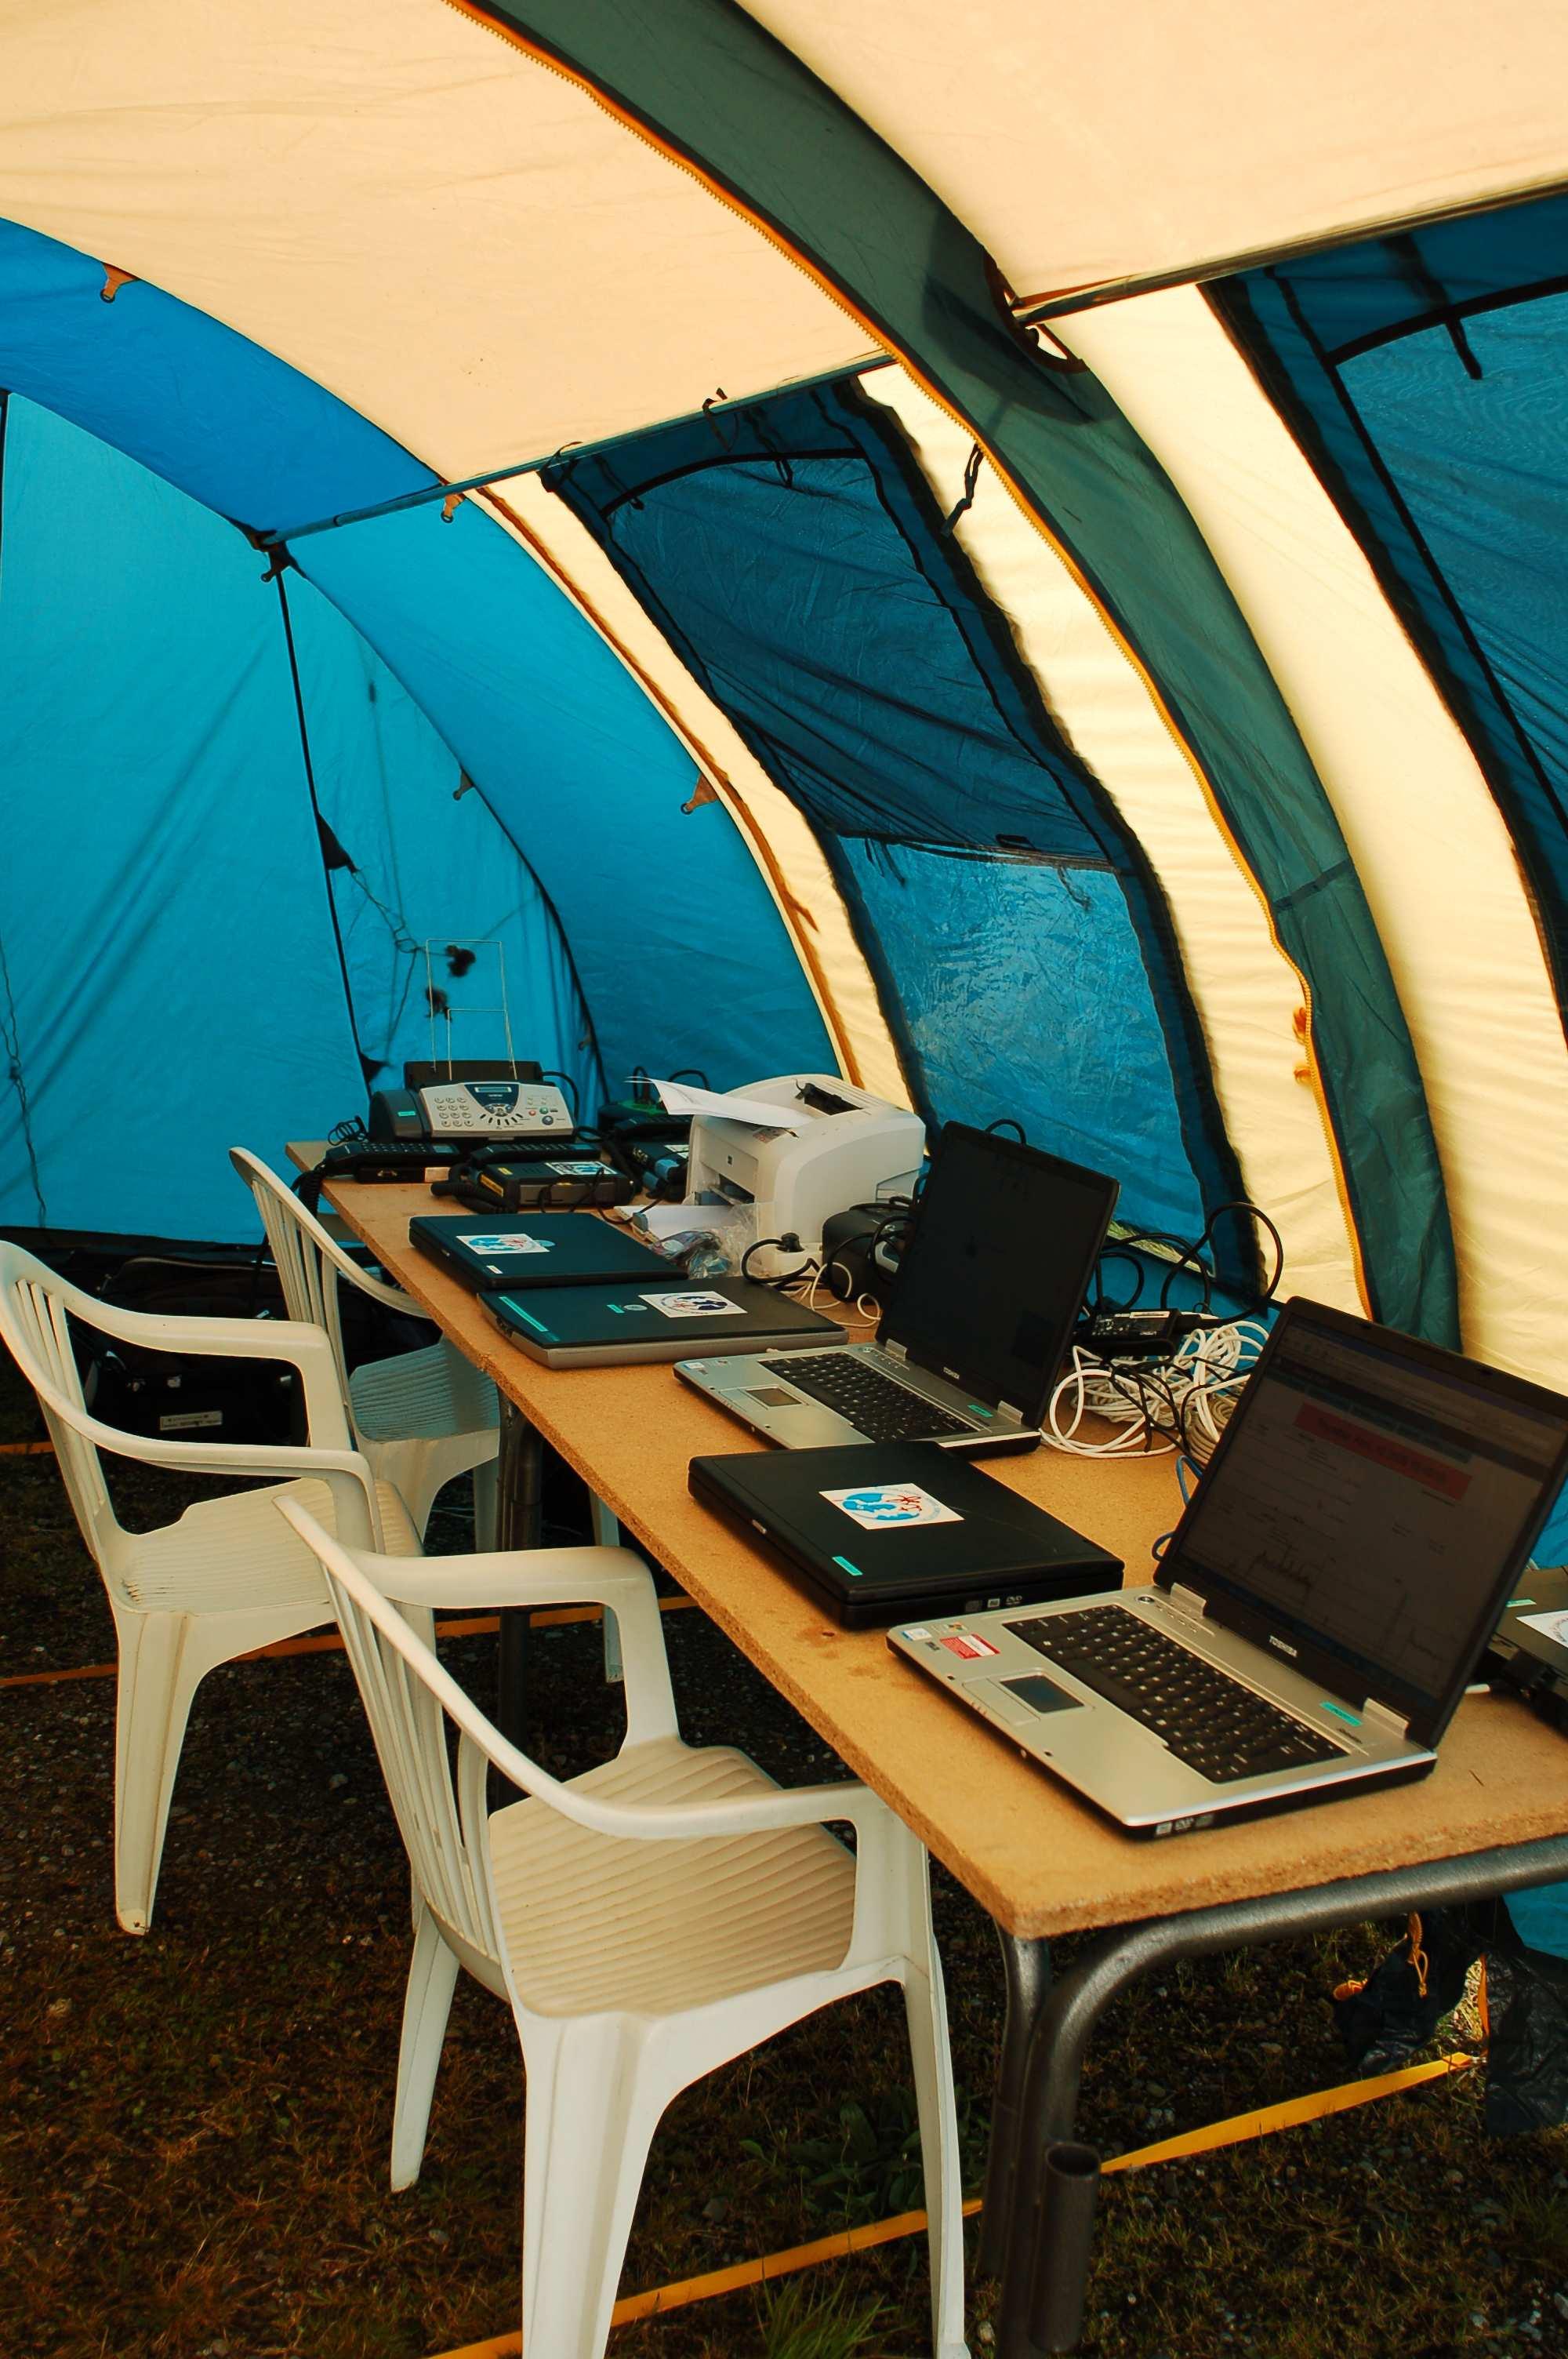 telecomms_centre_small.JPG